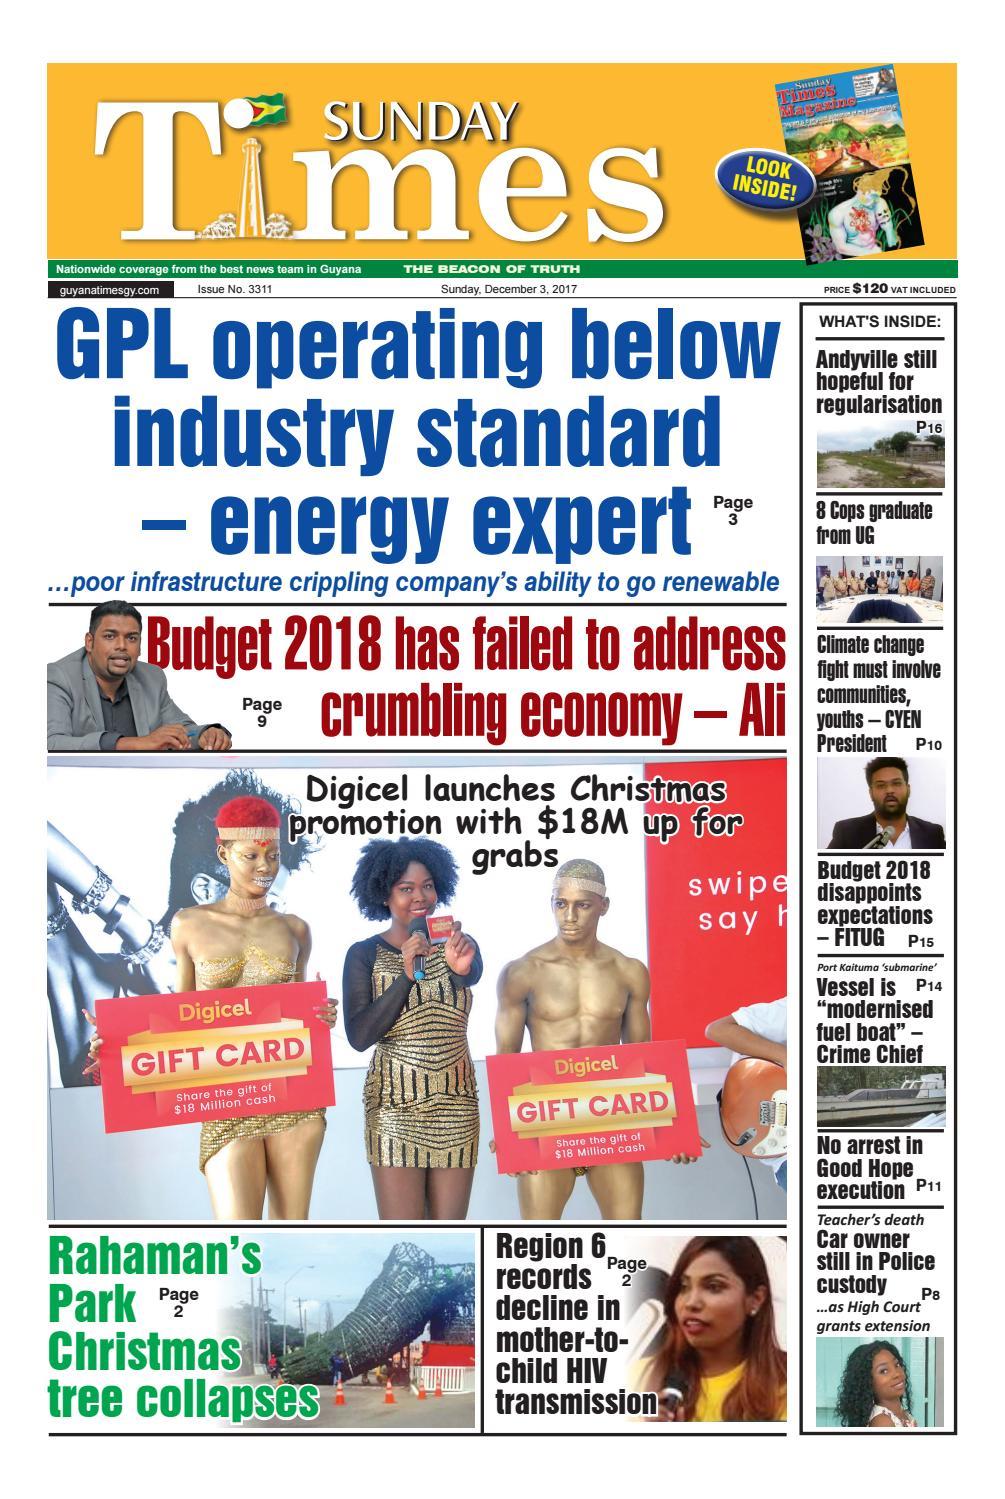 Guyanatimes 3 december 2017